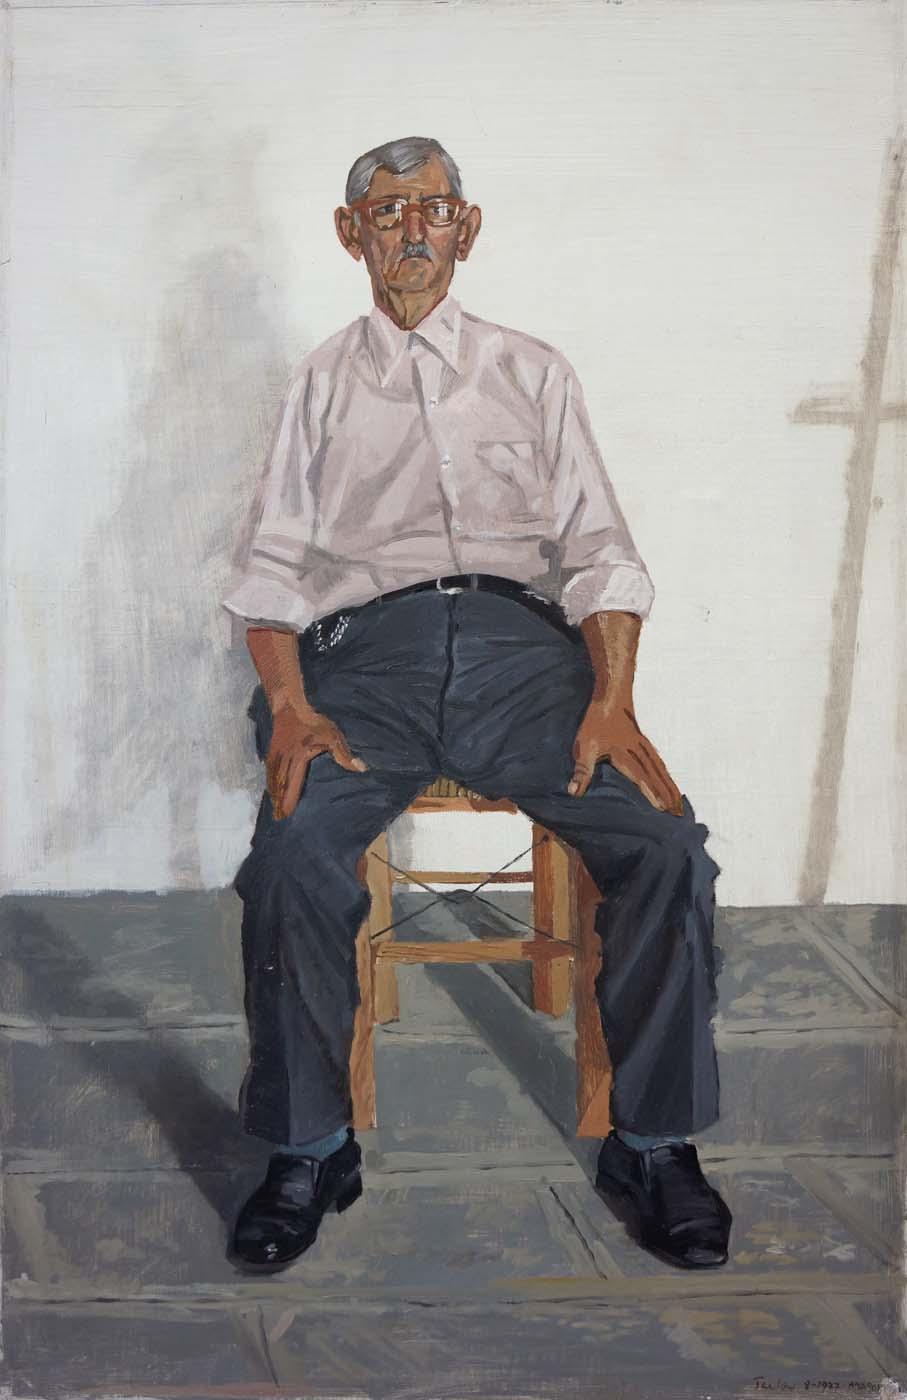 o kyrios yannis   1978 oil on canvas mounted on board, 48.5x31cm.  coll. the artist